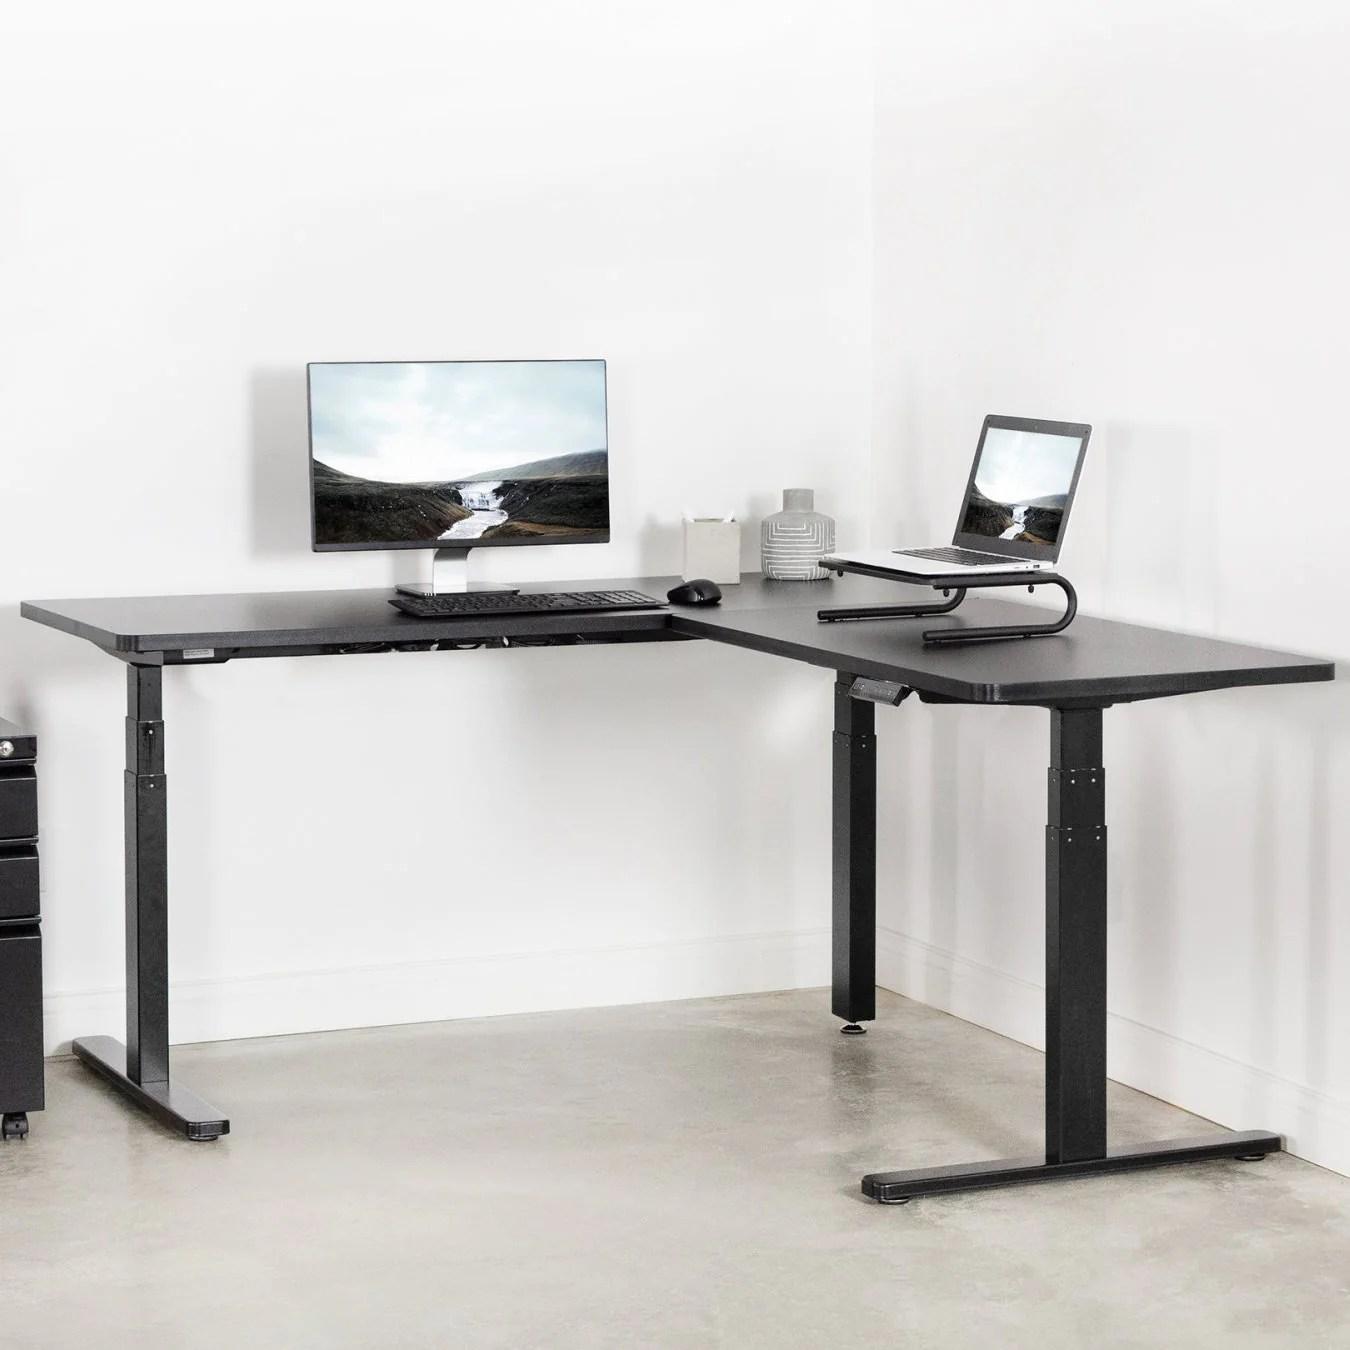 Vivo 67 X 60 Corner L Shaped Standing Desk Black Ergo Standing Desks